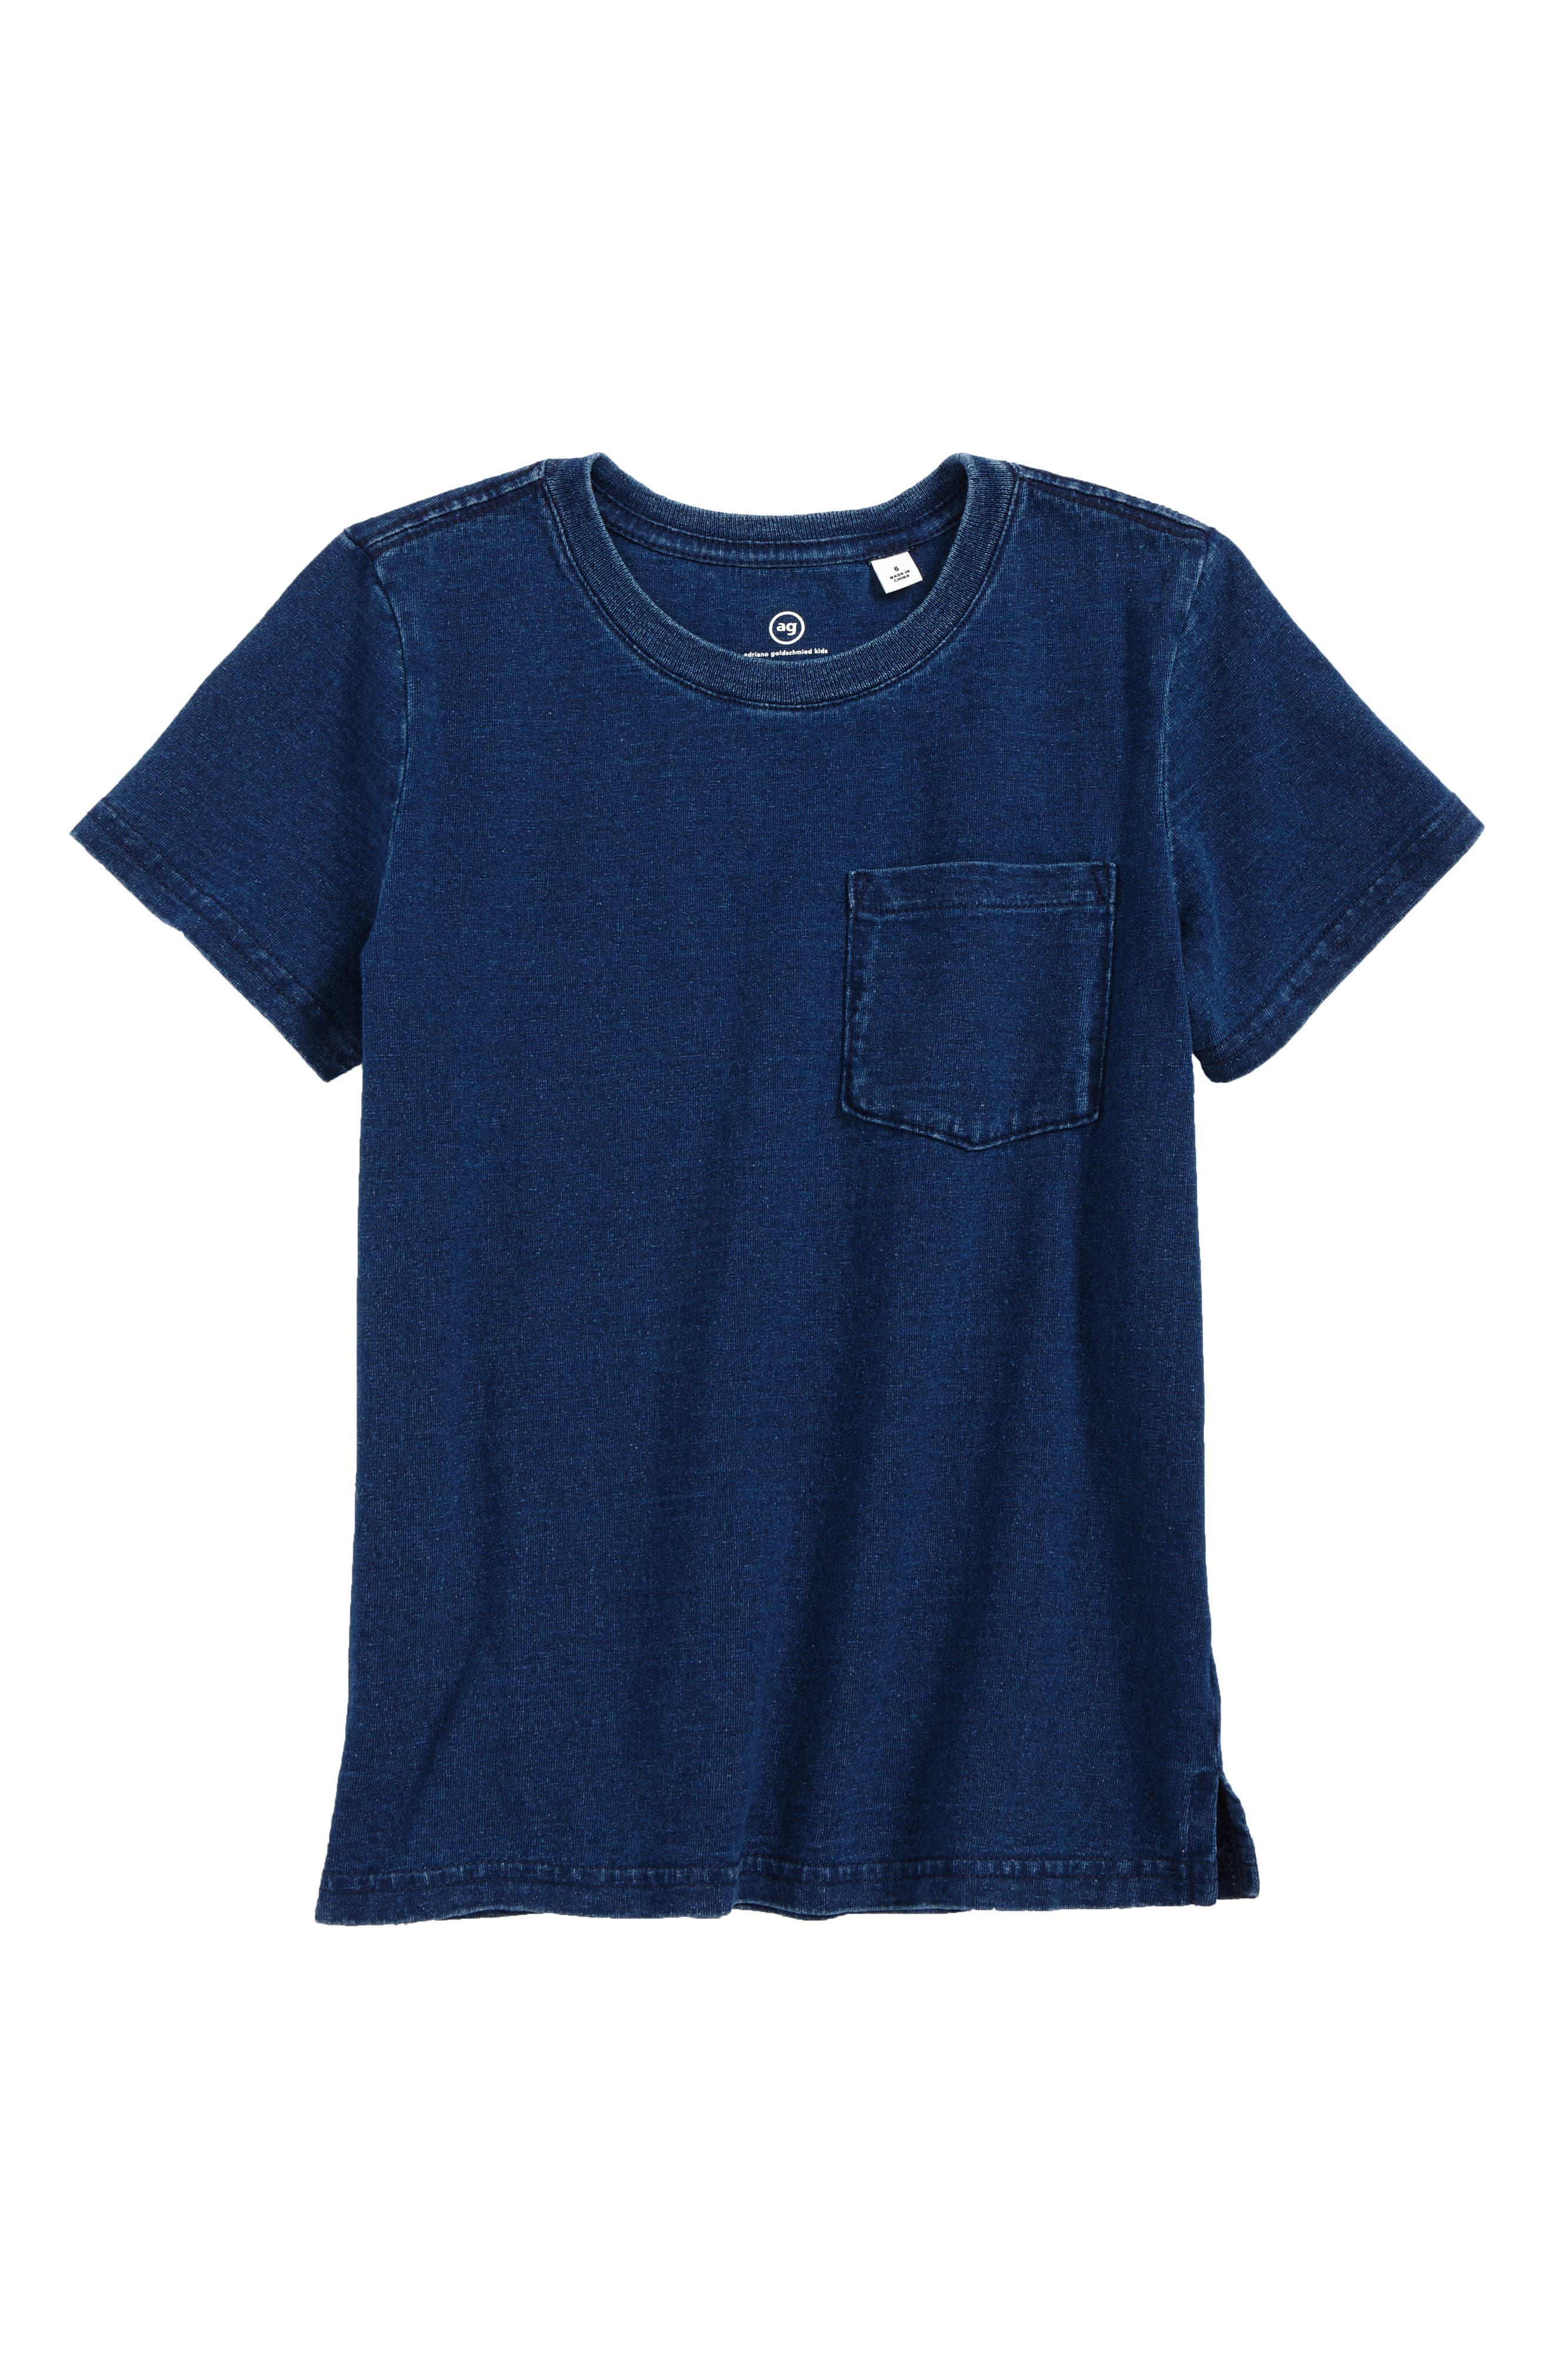 AG Pigment T-Shirt,                             Main thumbnail 1, color,                             423